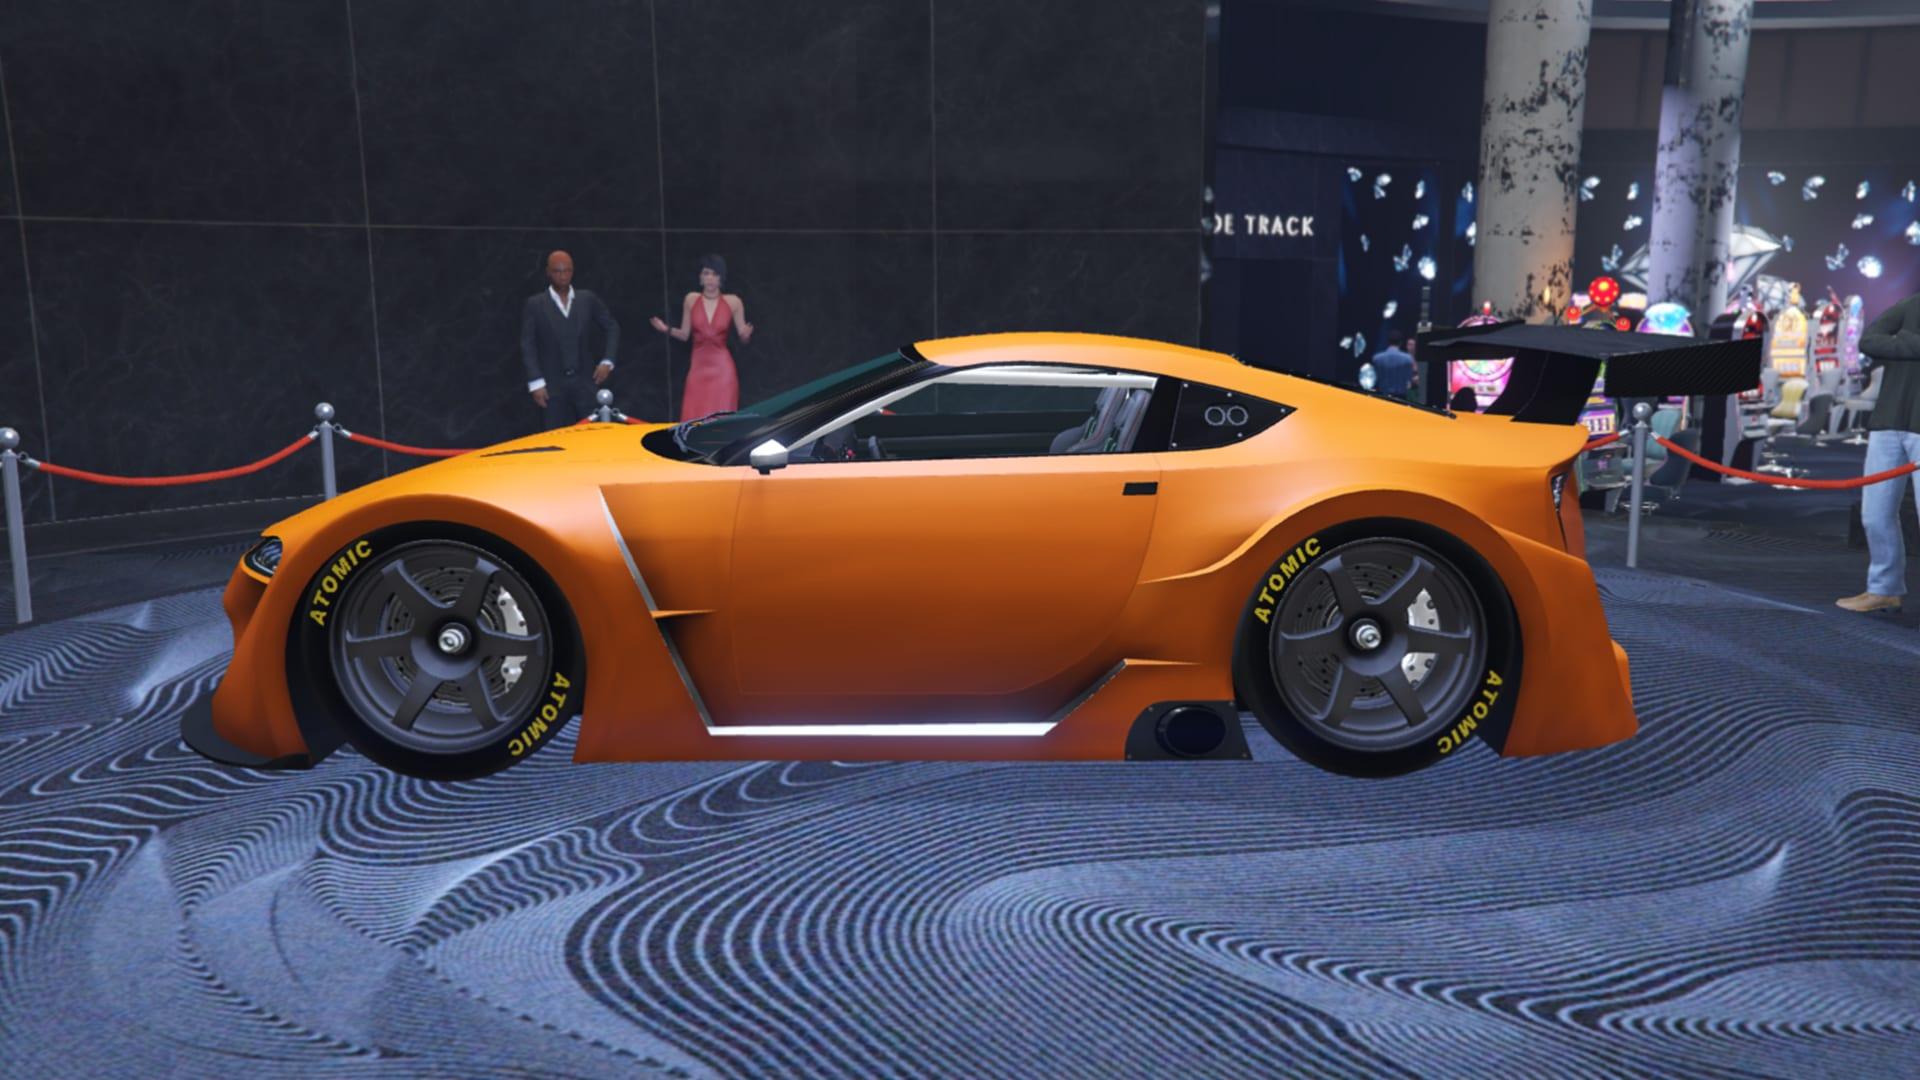 Rennwagen Emperor ETR1 - Glücksrad in GTA Online